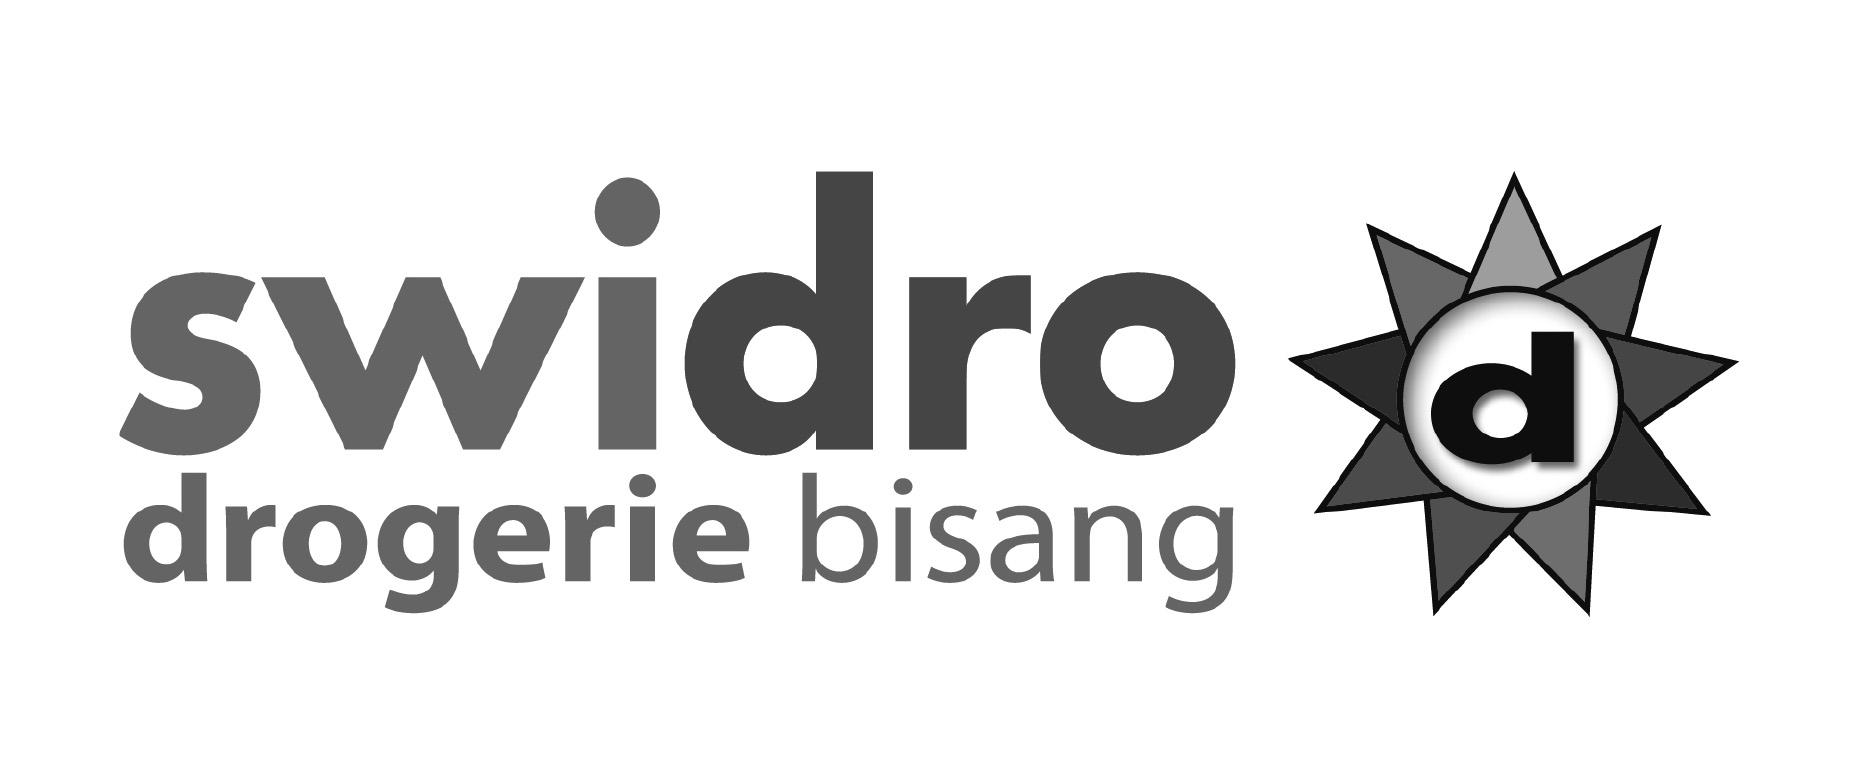 elgg-swidor